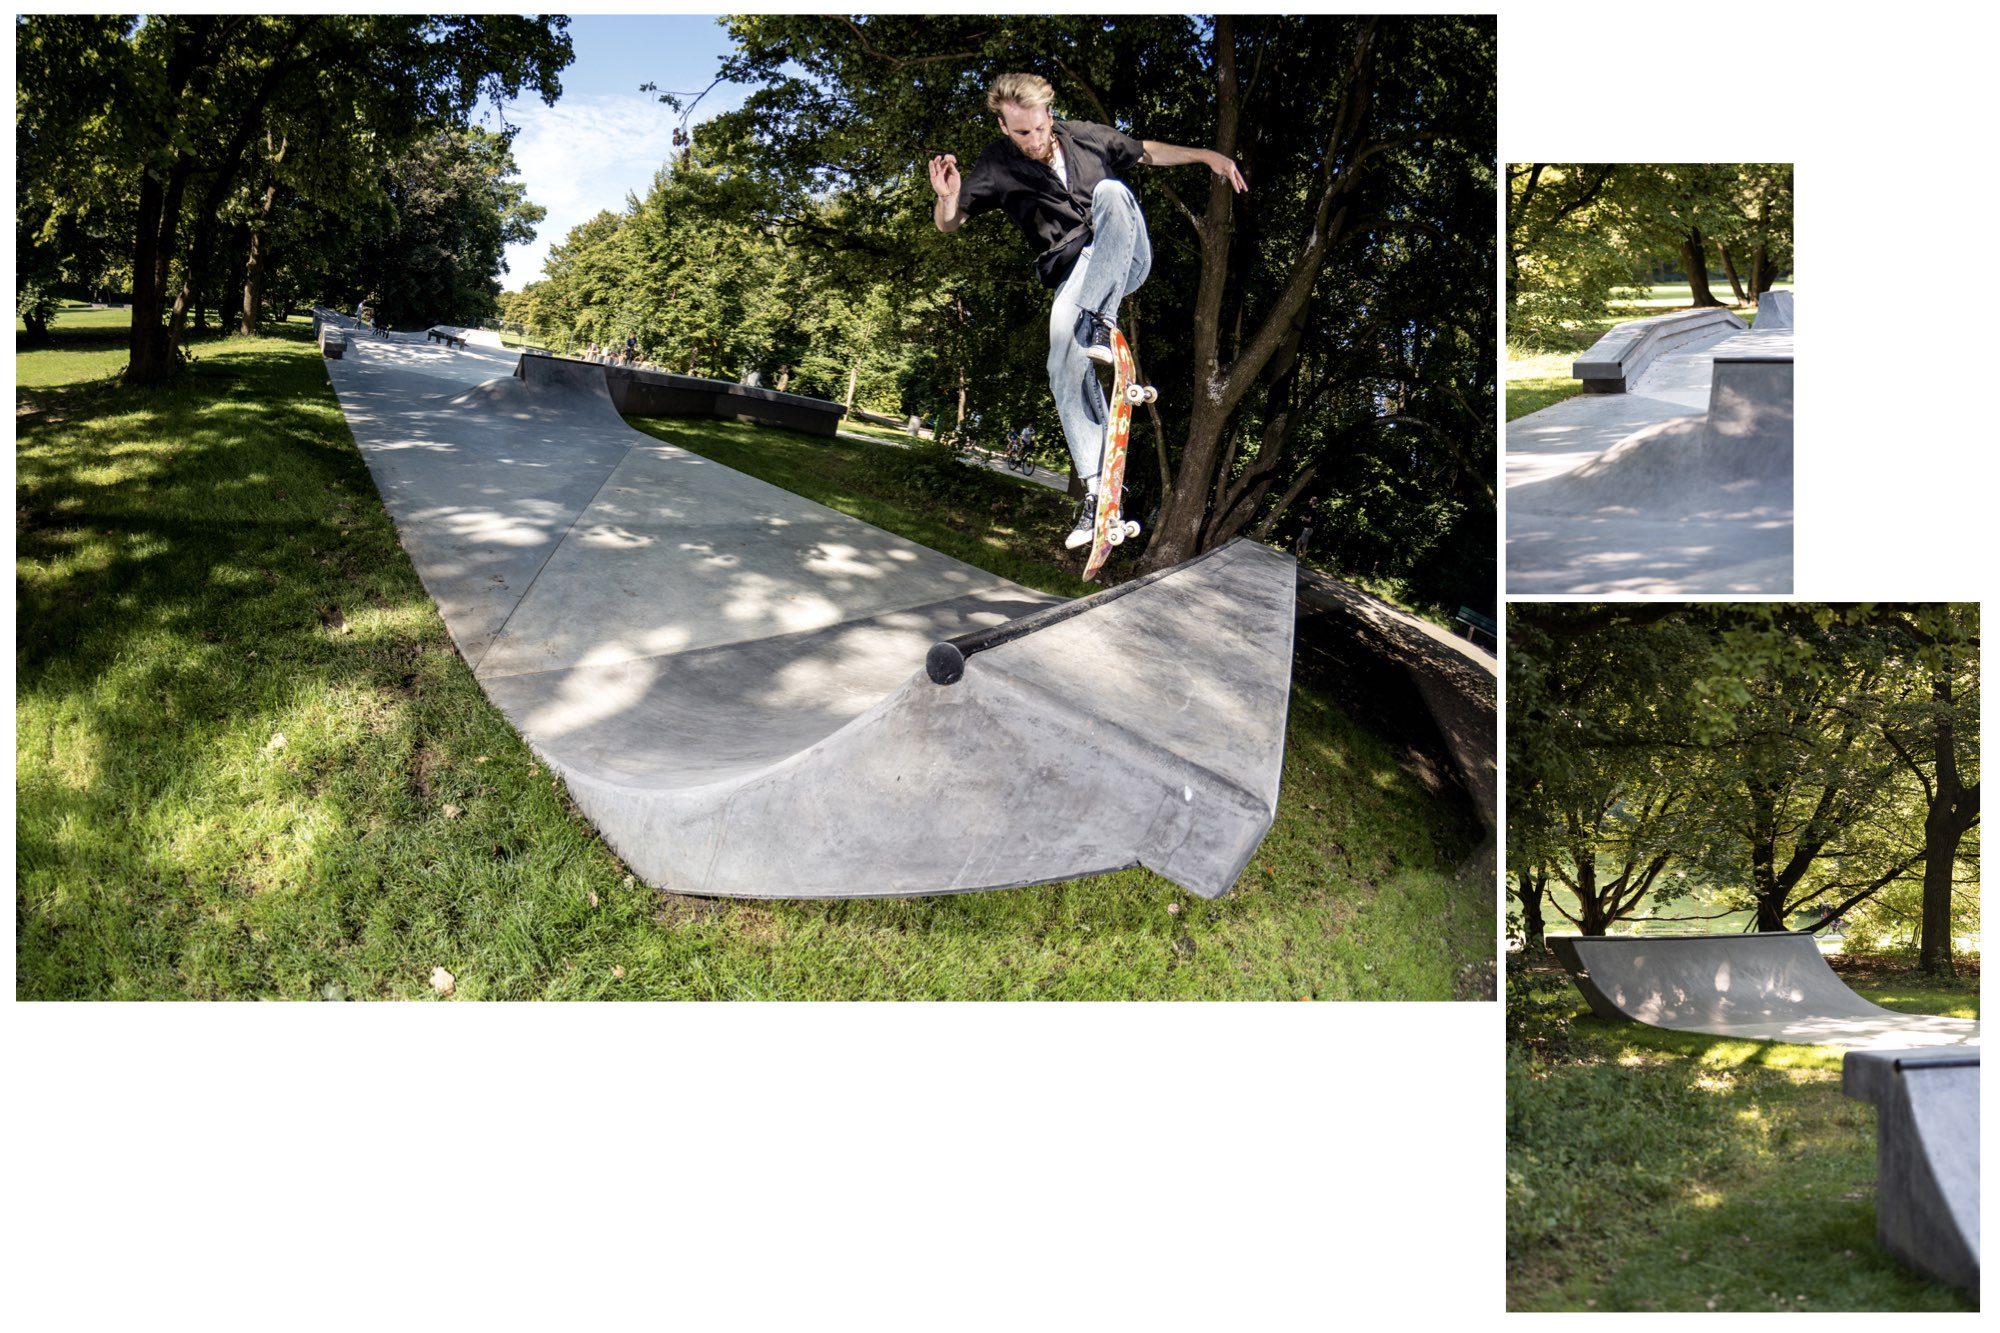 lndskt_skatepark_planung_hirschgarten_muenchen_chris_bradl